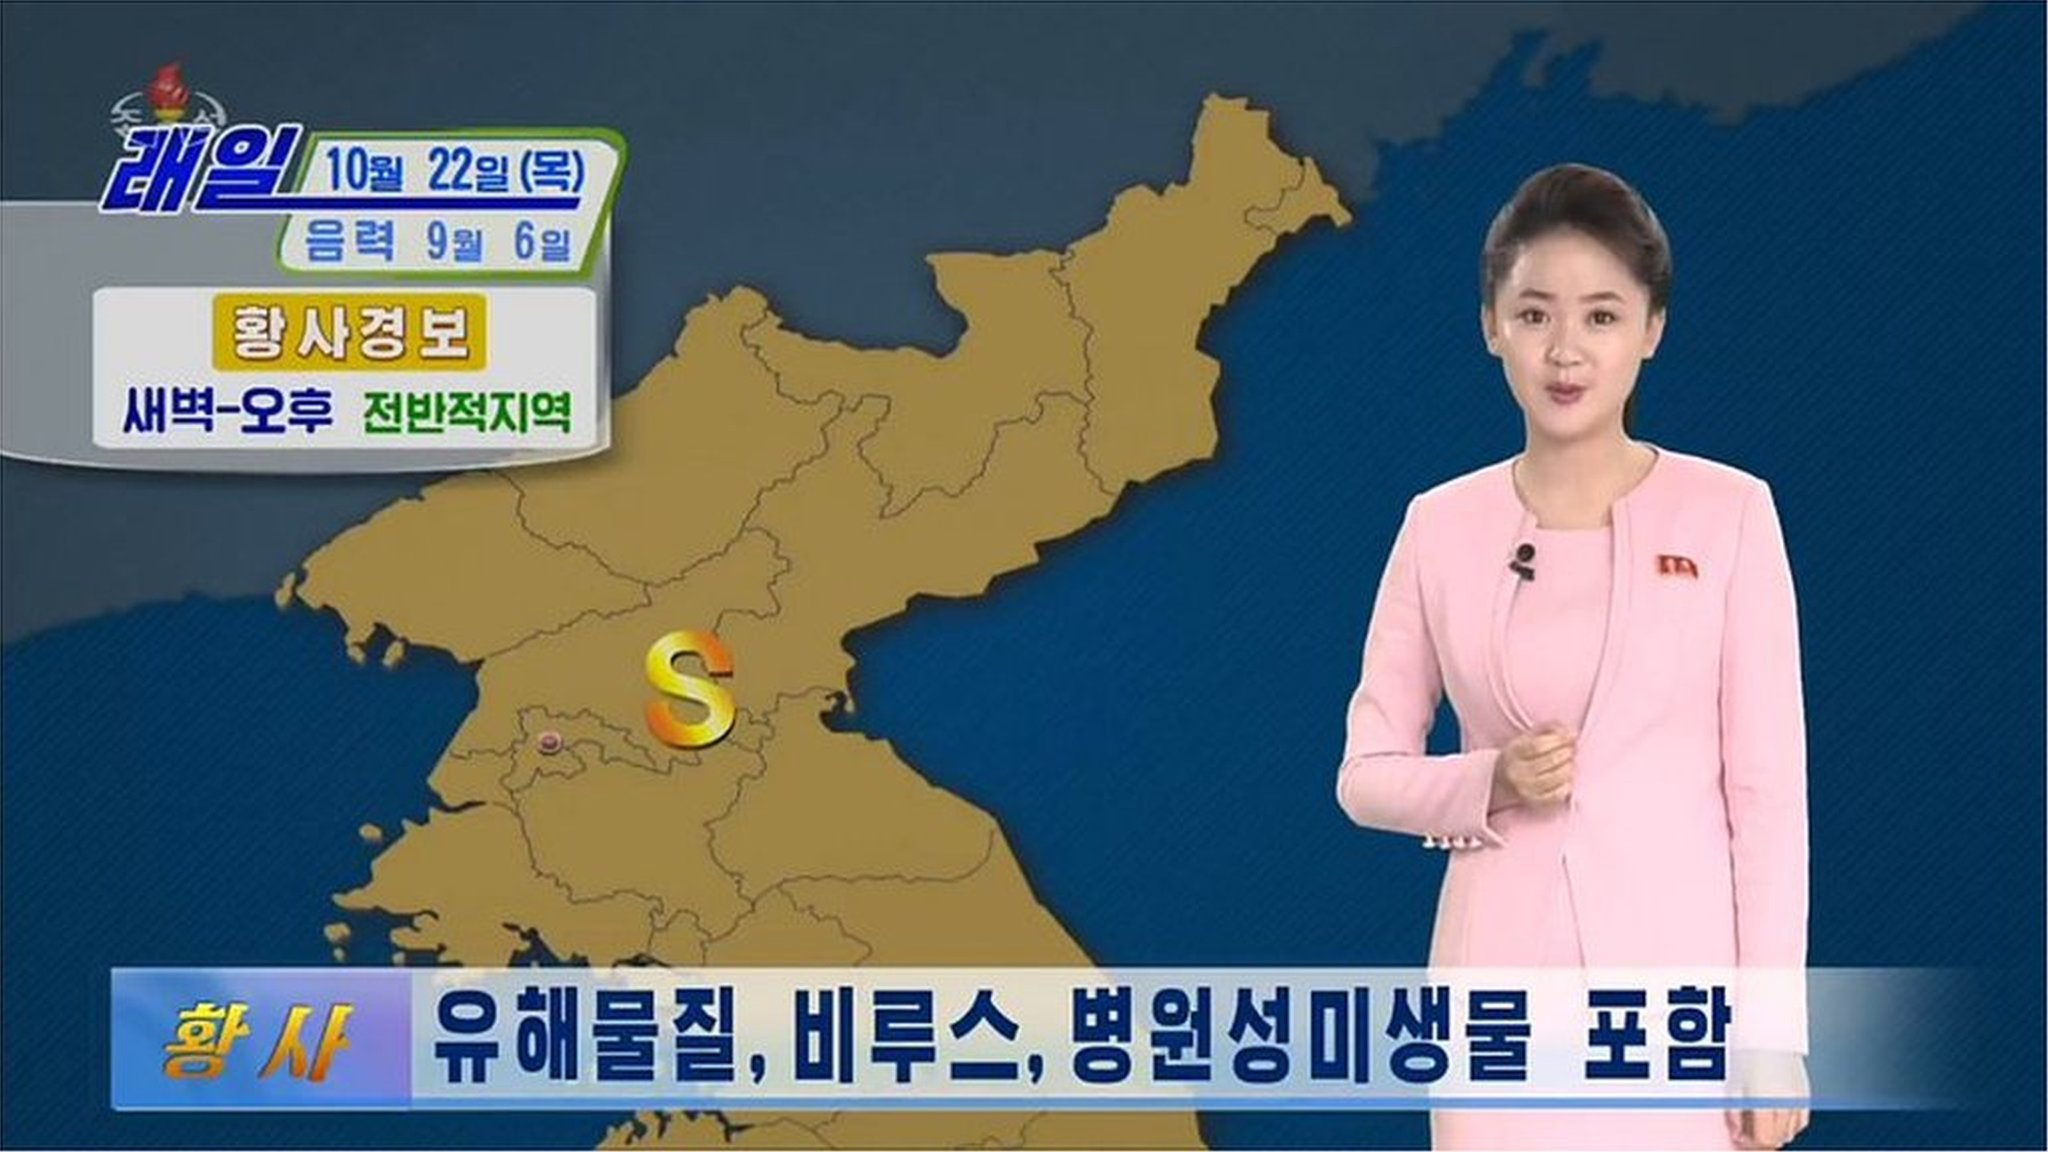 制裁 世界 反応 韓国 の